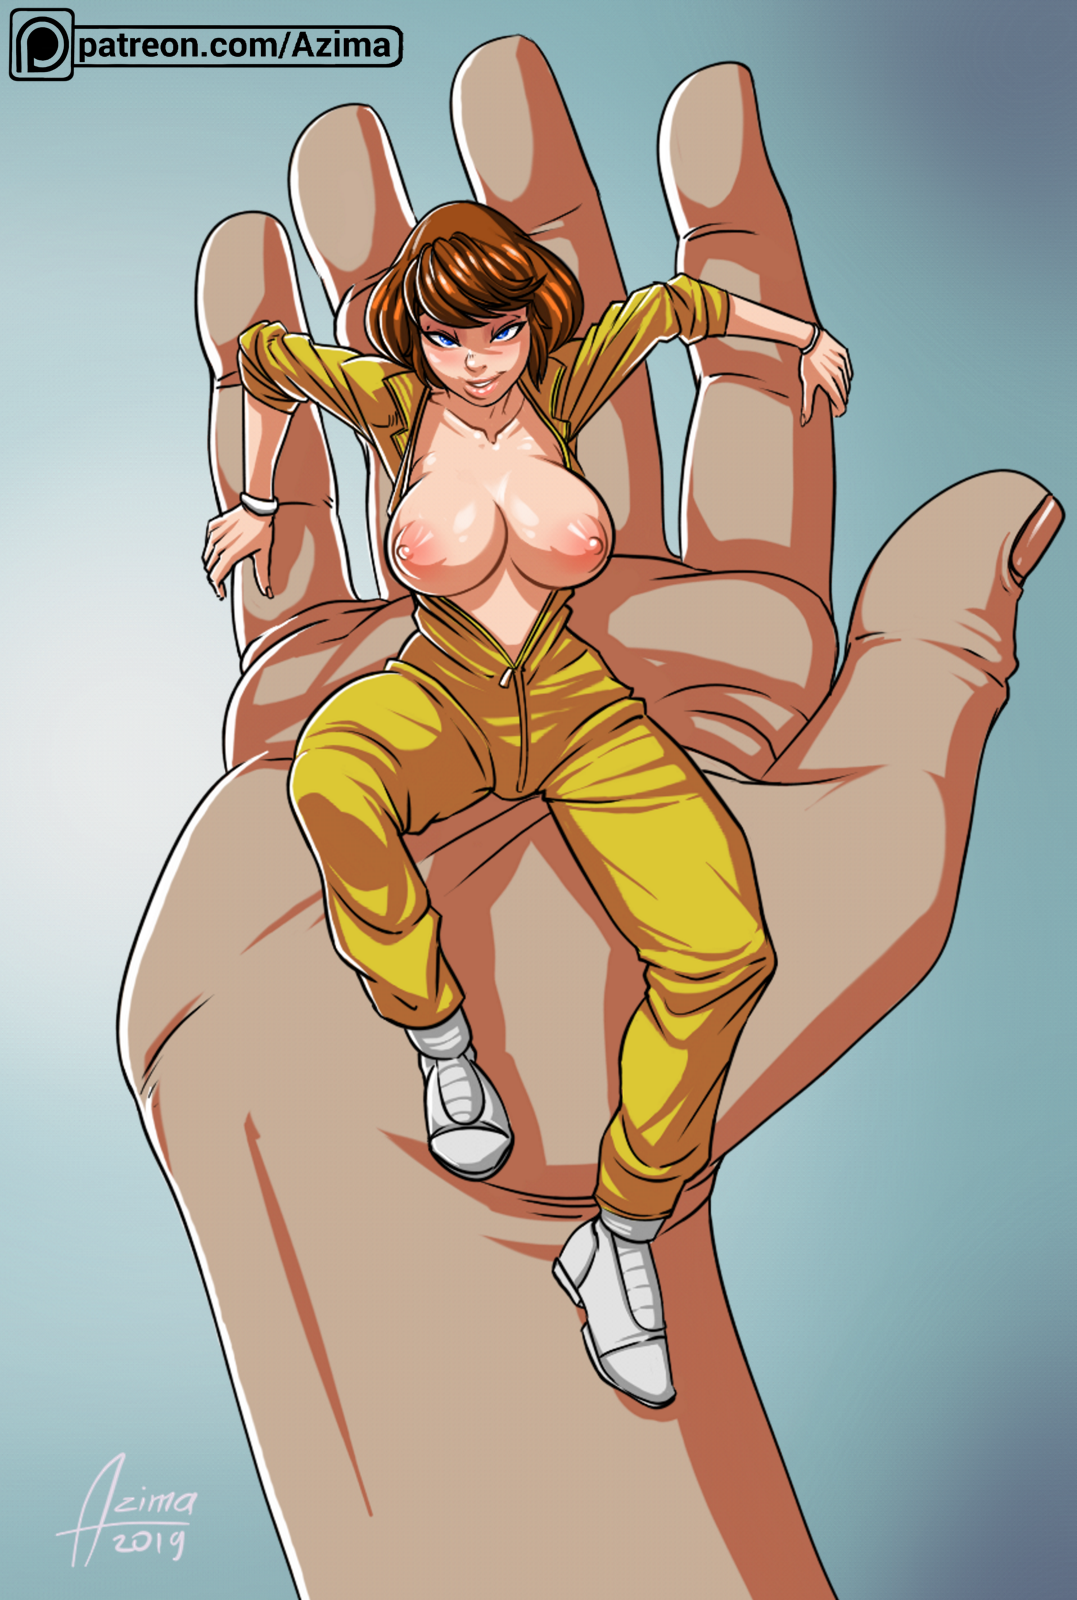 April's minigirl version